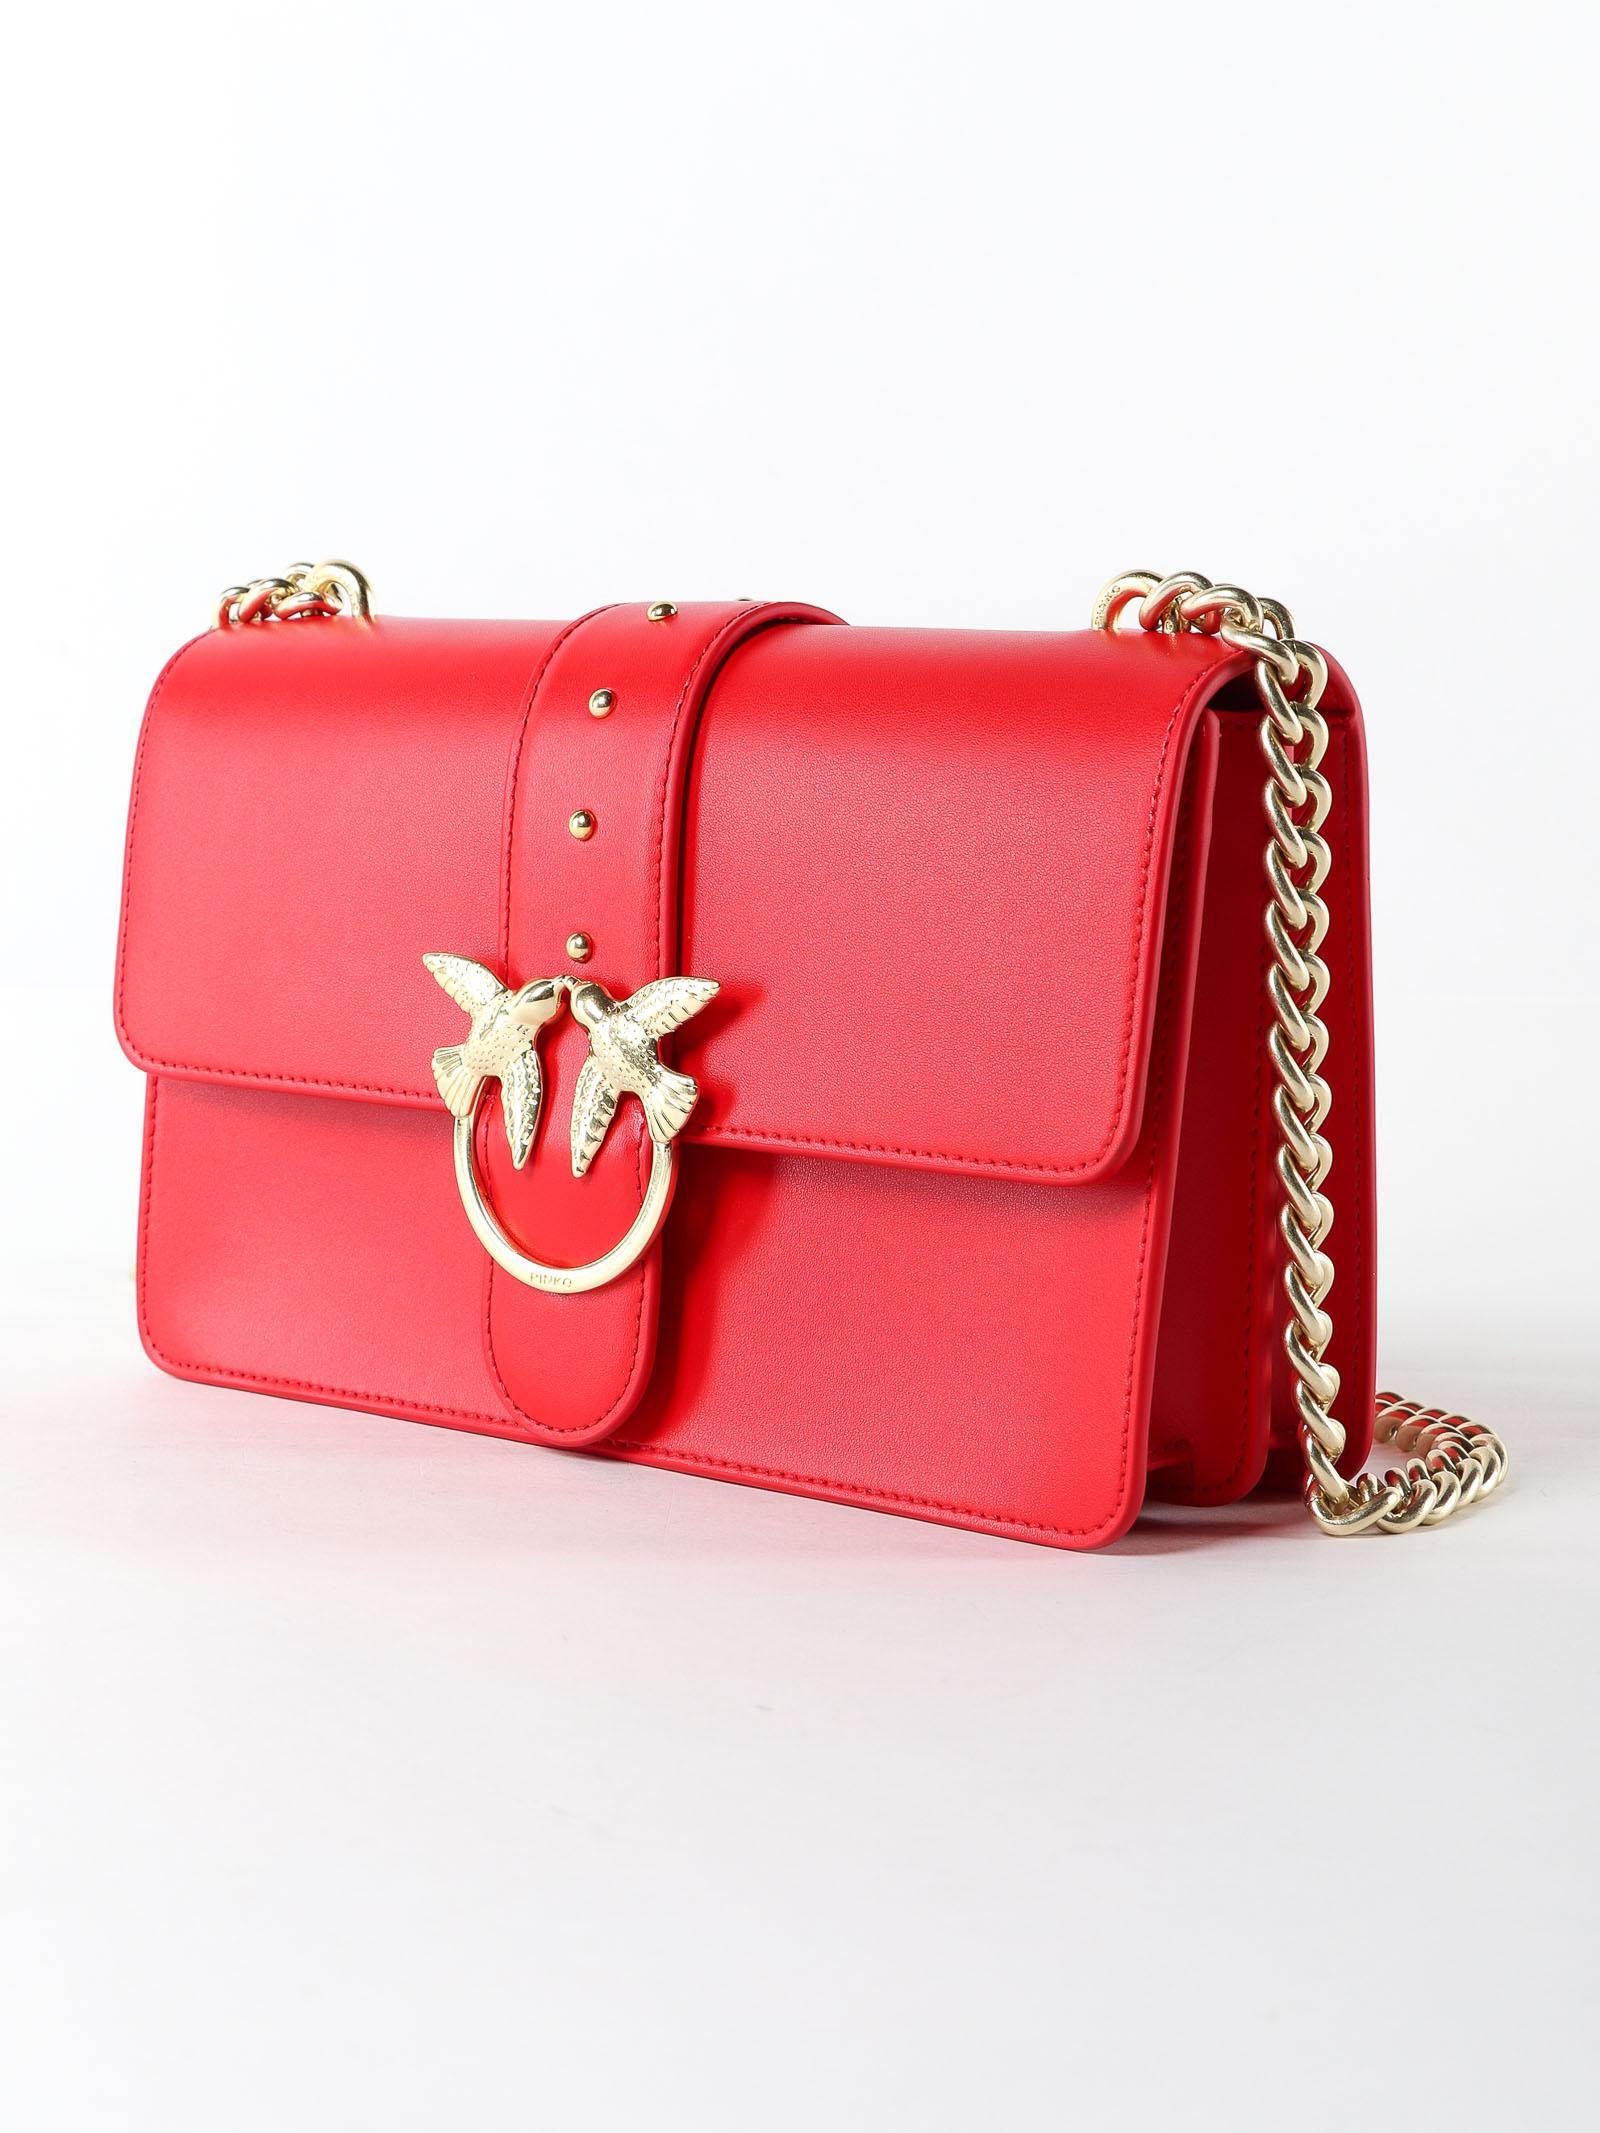 950217a7af8 Pinko Love Simply 8 Bag - Lyst